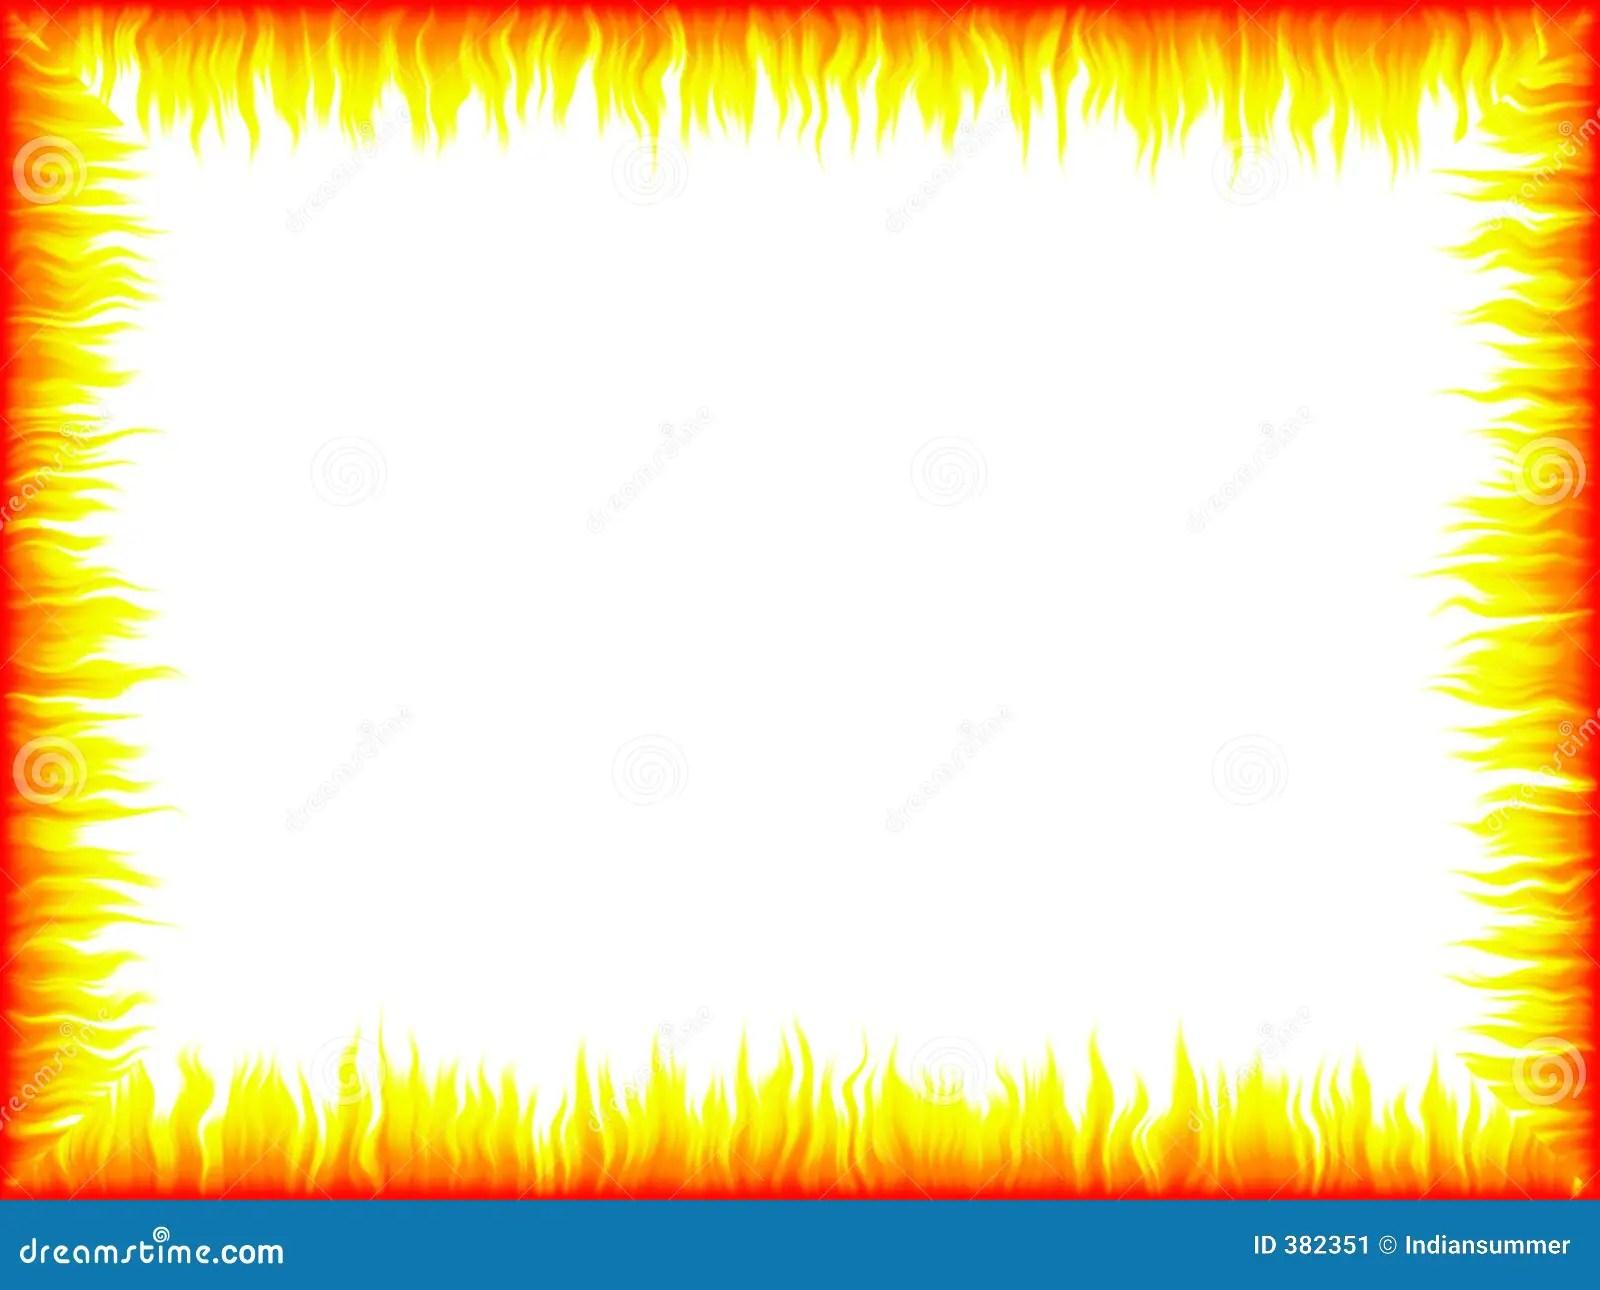 Flame Frame Stock Image Image 382351